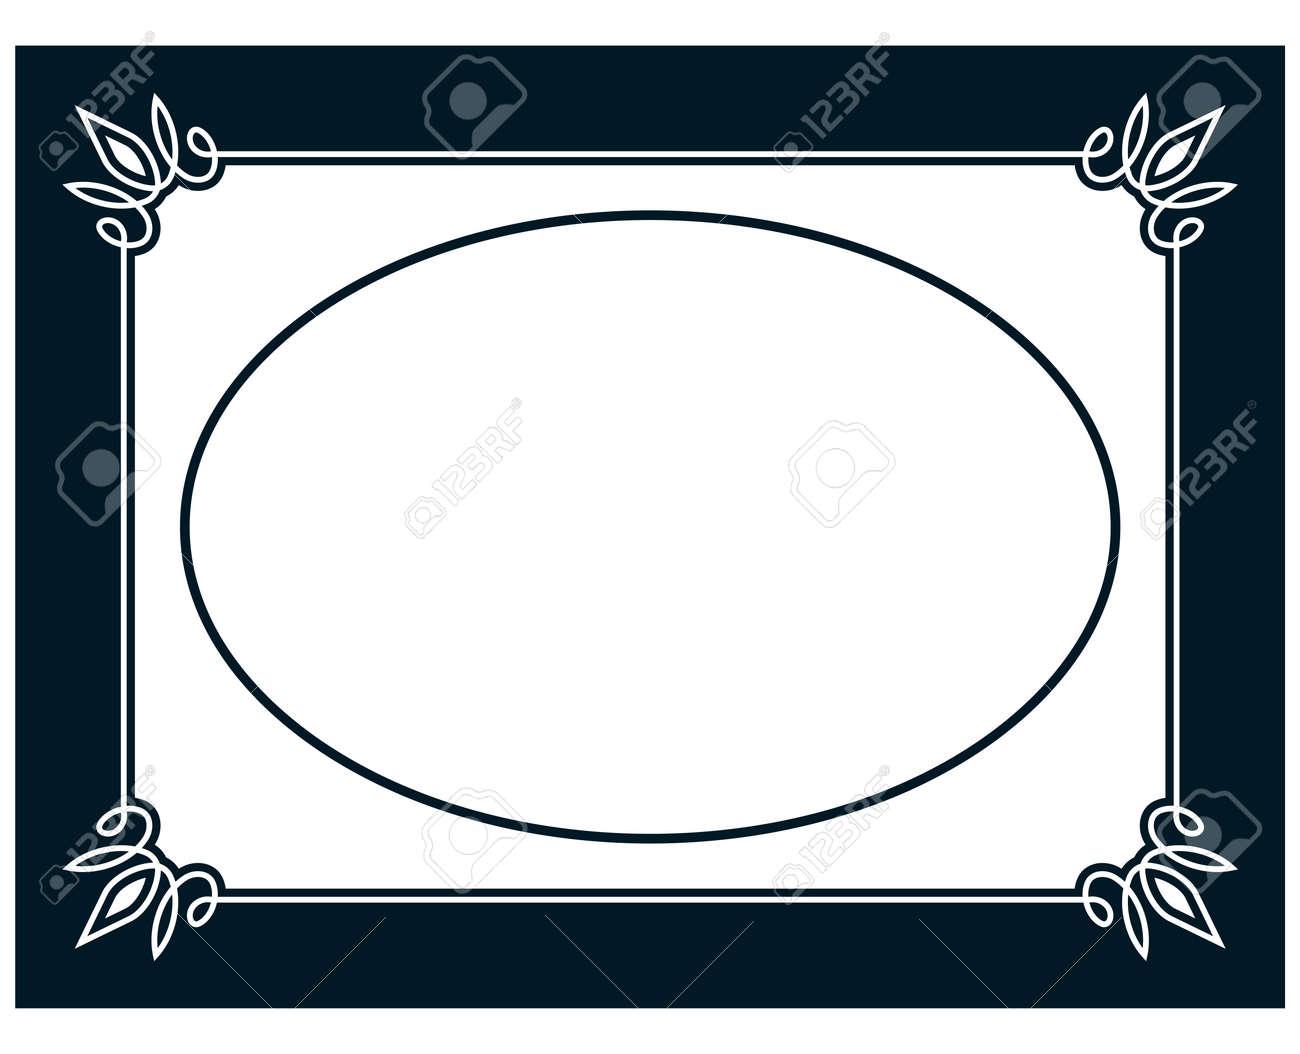 Oval Border Photo Frame Deco Vector Simple Vertical Line Signboard Stock